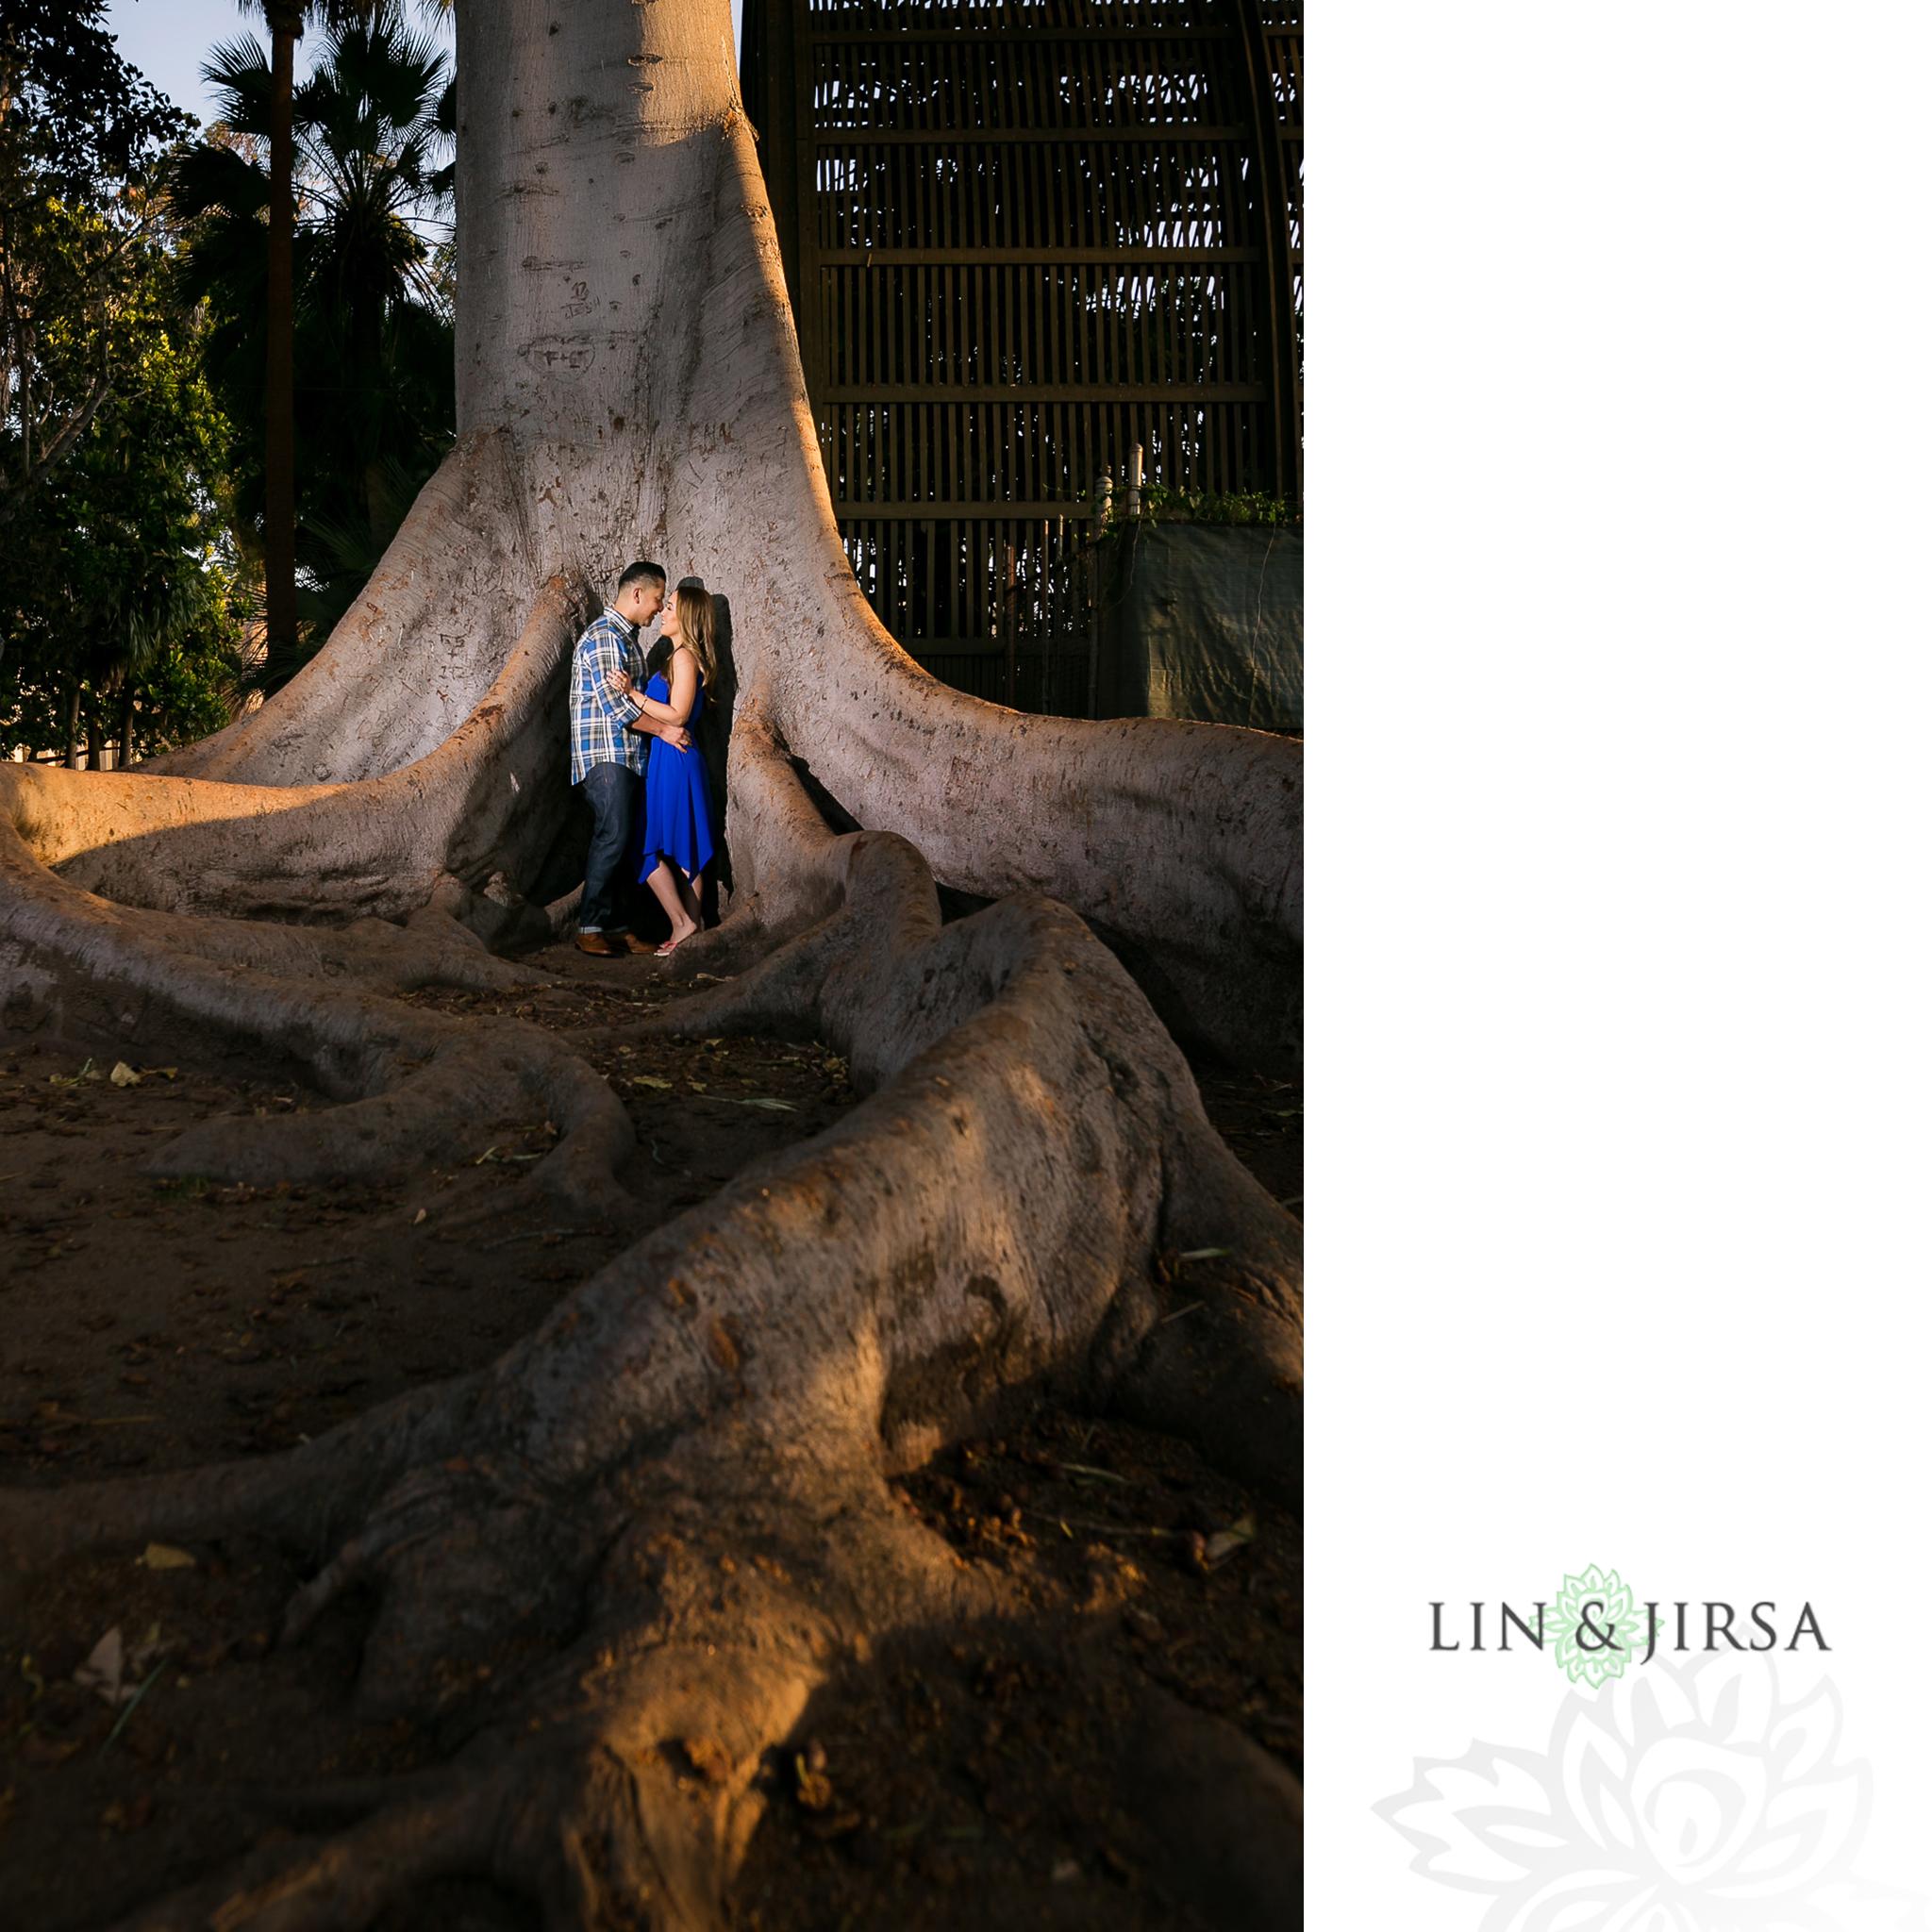 08-balboa-park-san-diego-engagement-photography